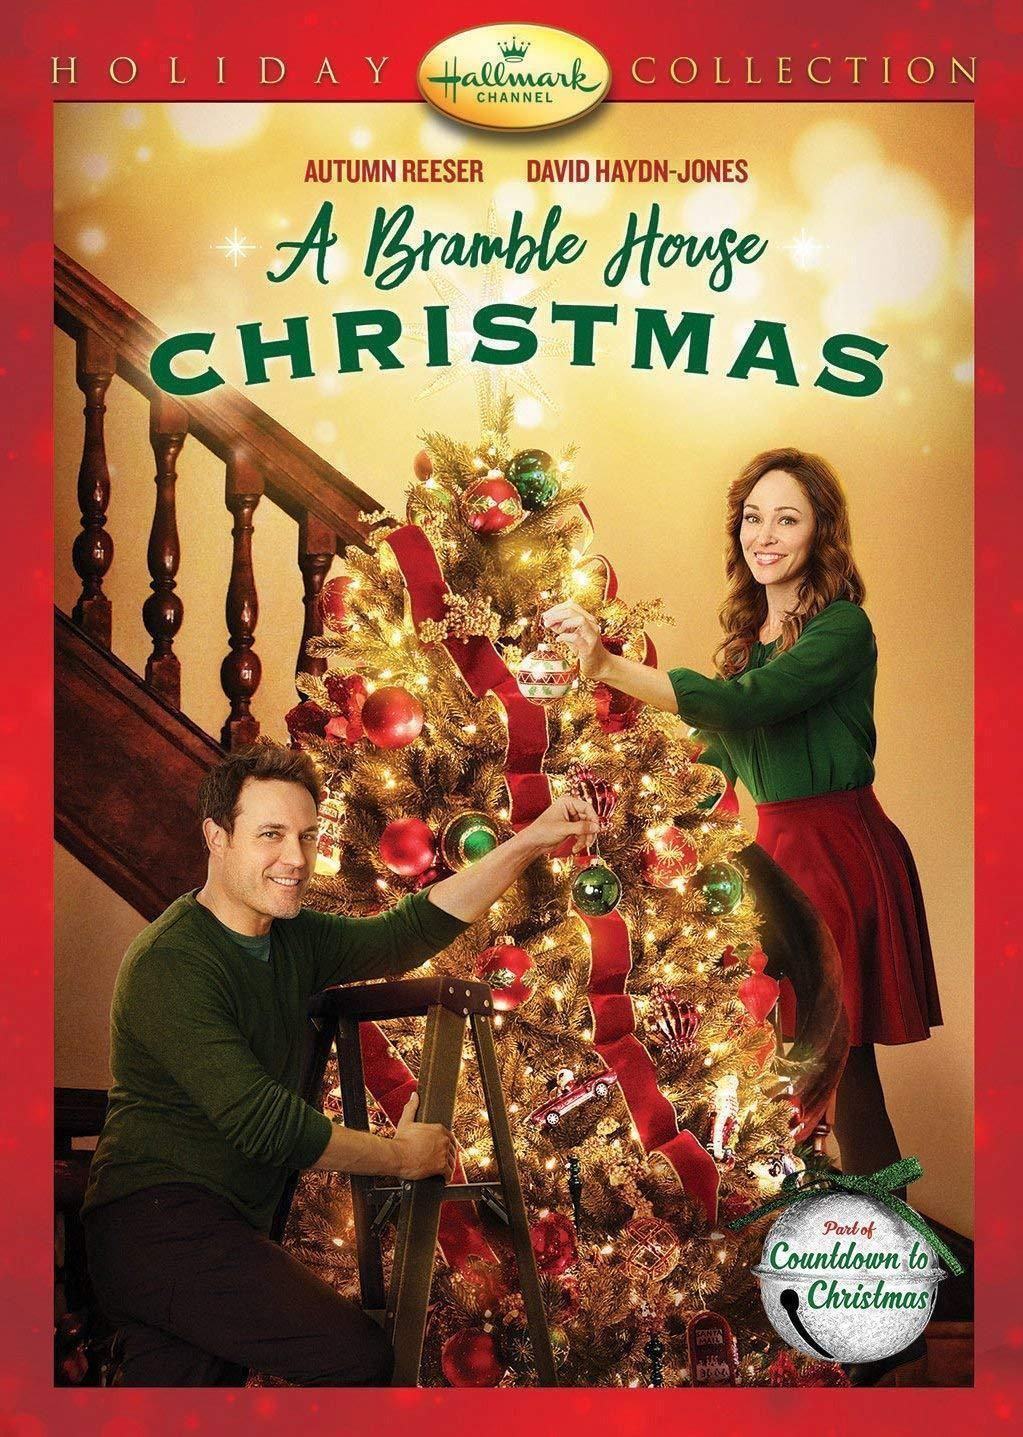 Rarezies Booth At Bonanza Dvds Movies Dvd Hd Dvd Blu Christmas Dvd Hallmark Christmas Movies Hallmark Movies